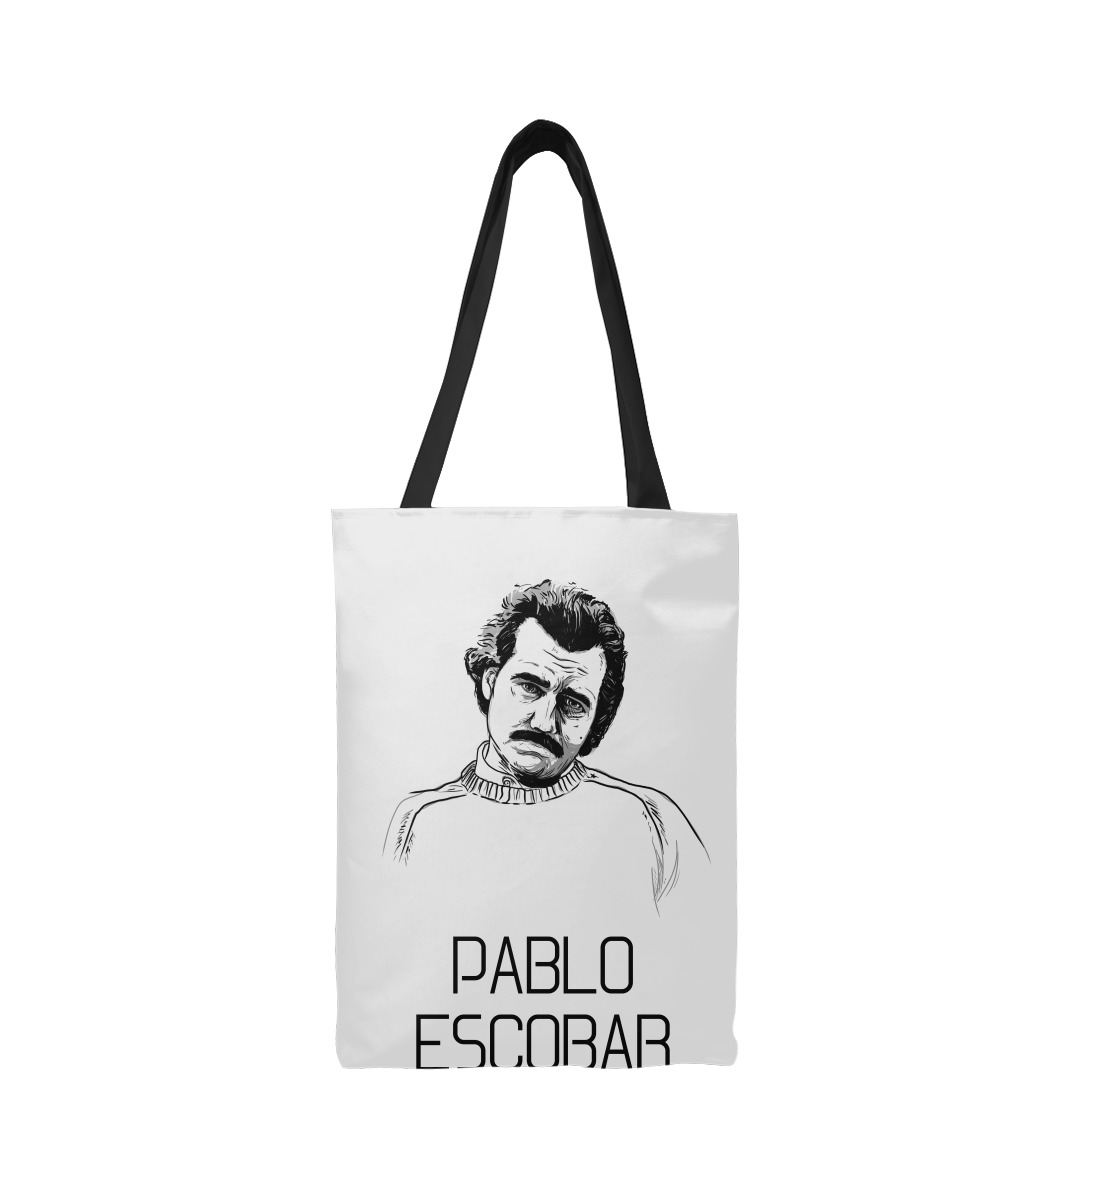 Pablo Escobal frederick fyvie bruce pablo